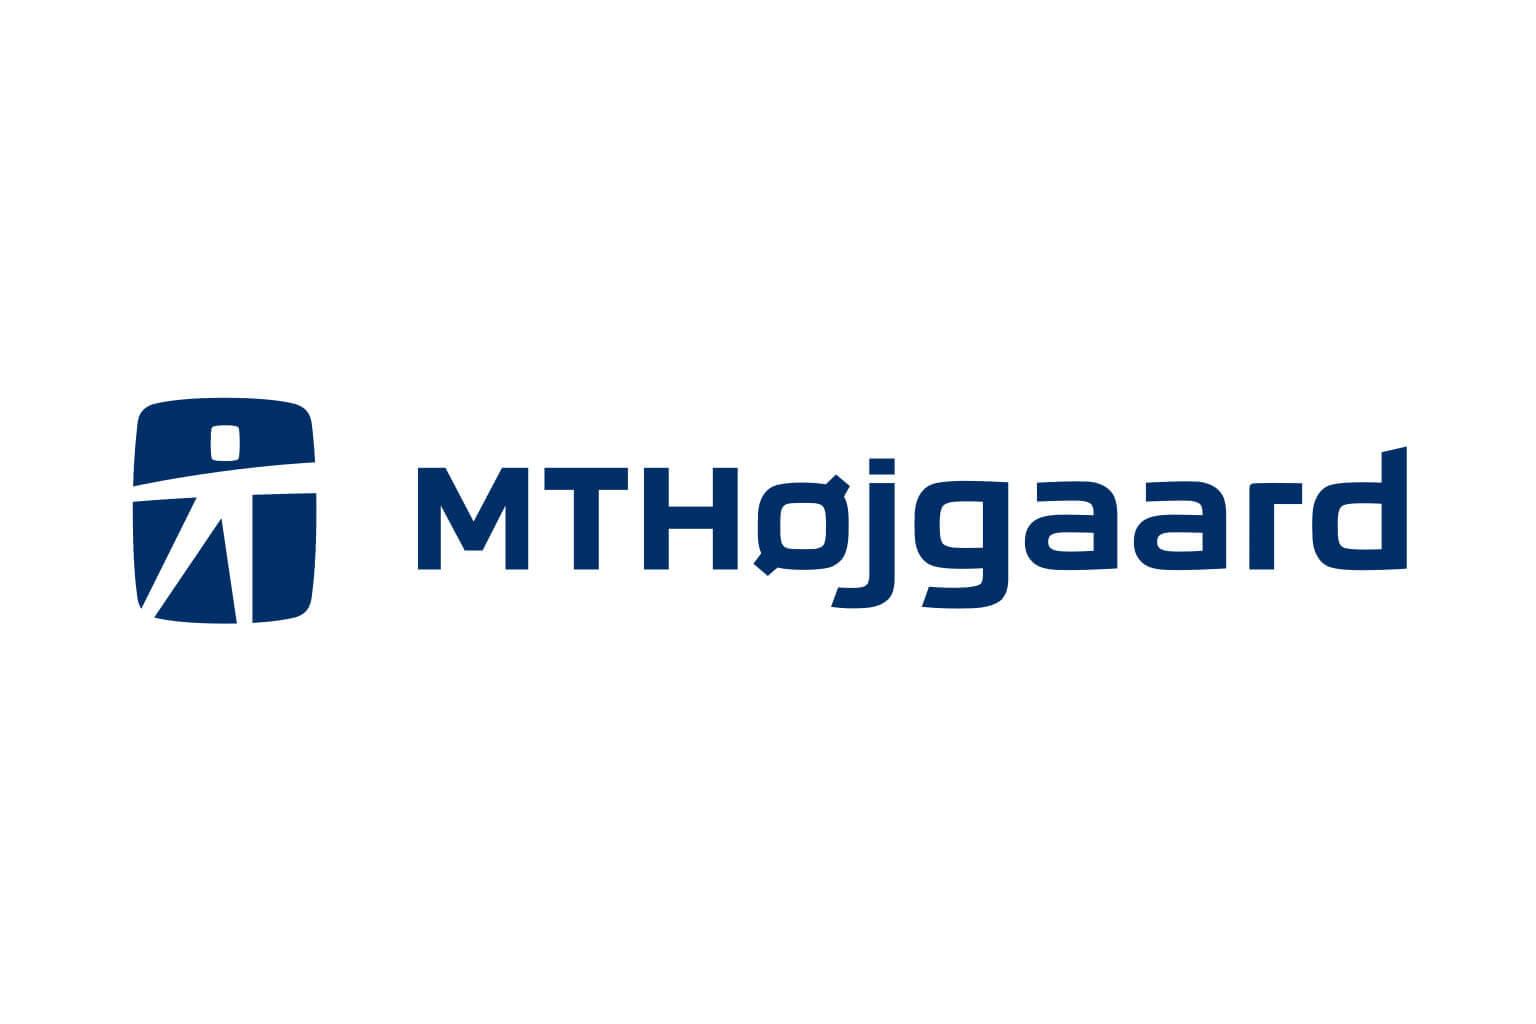 MTHojgaard